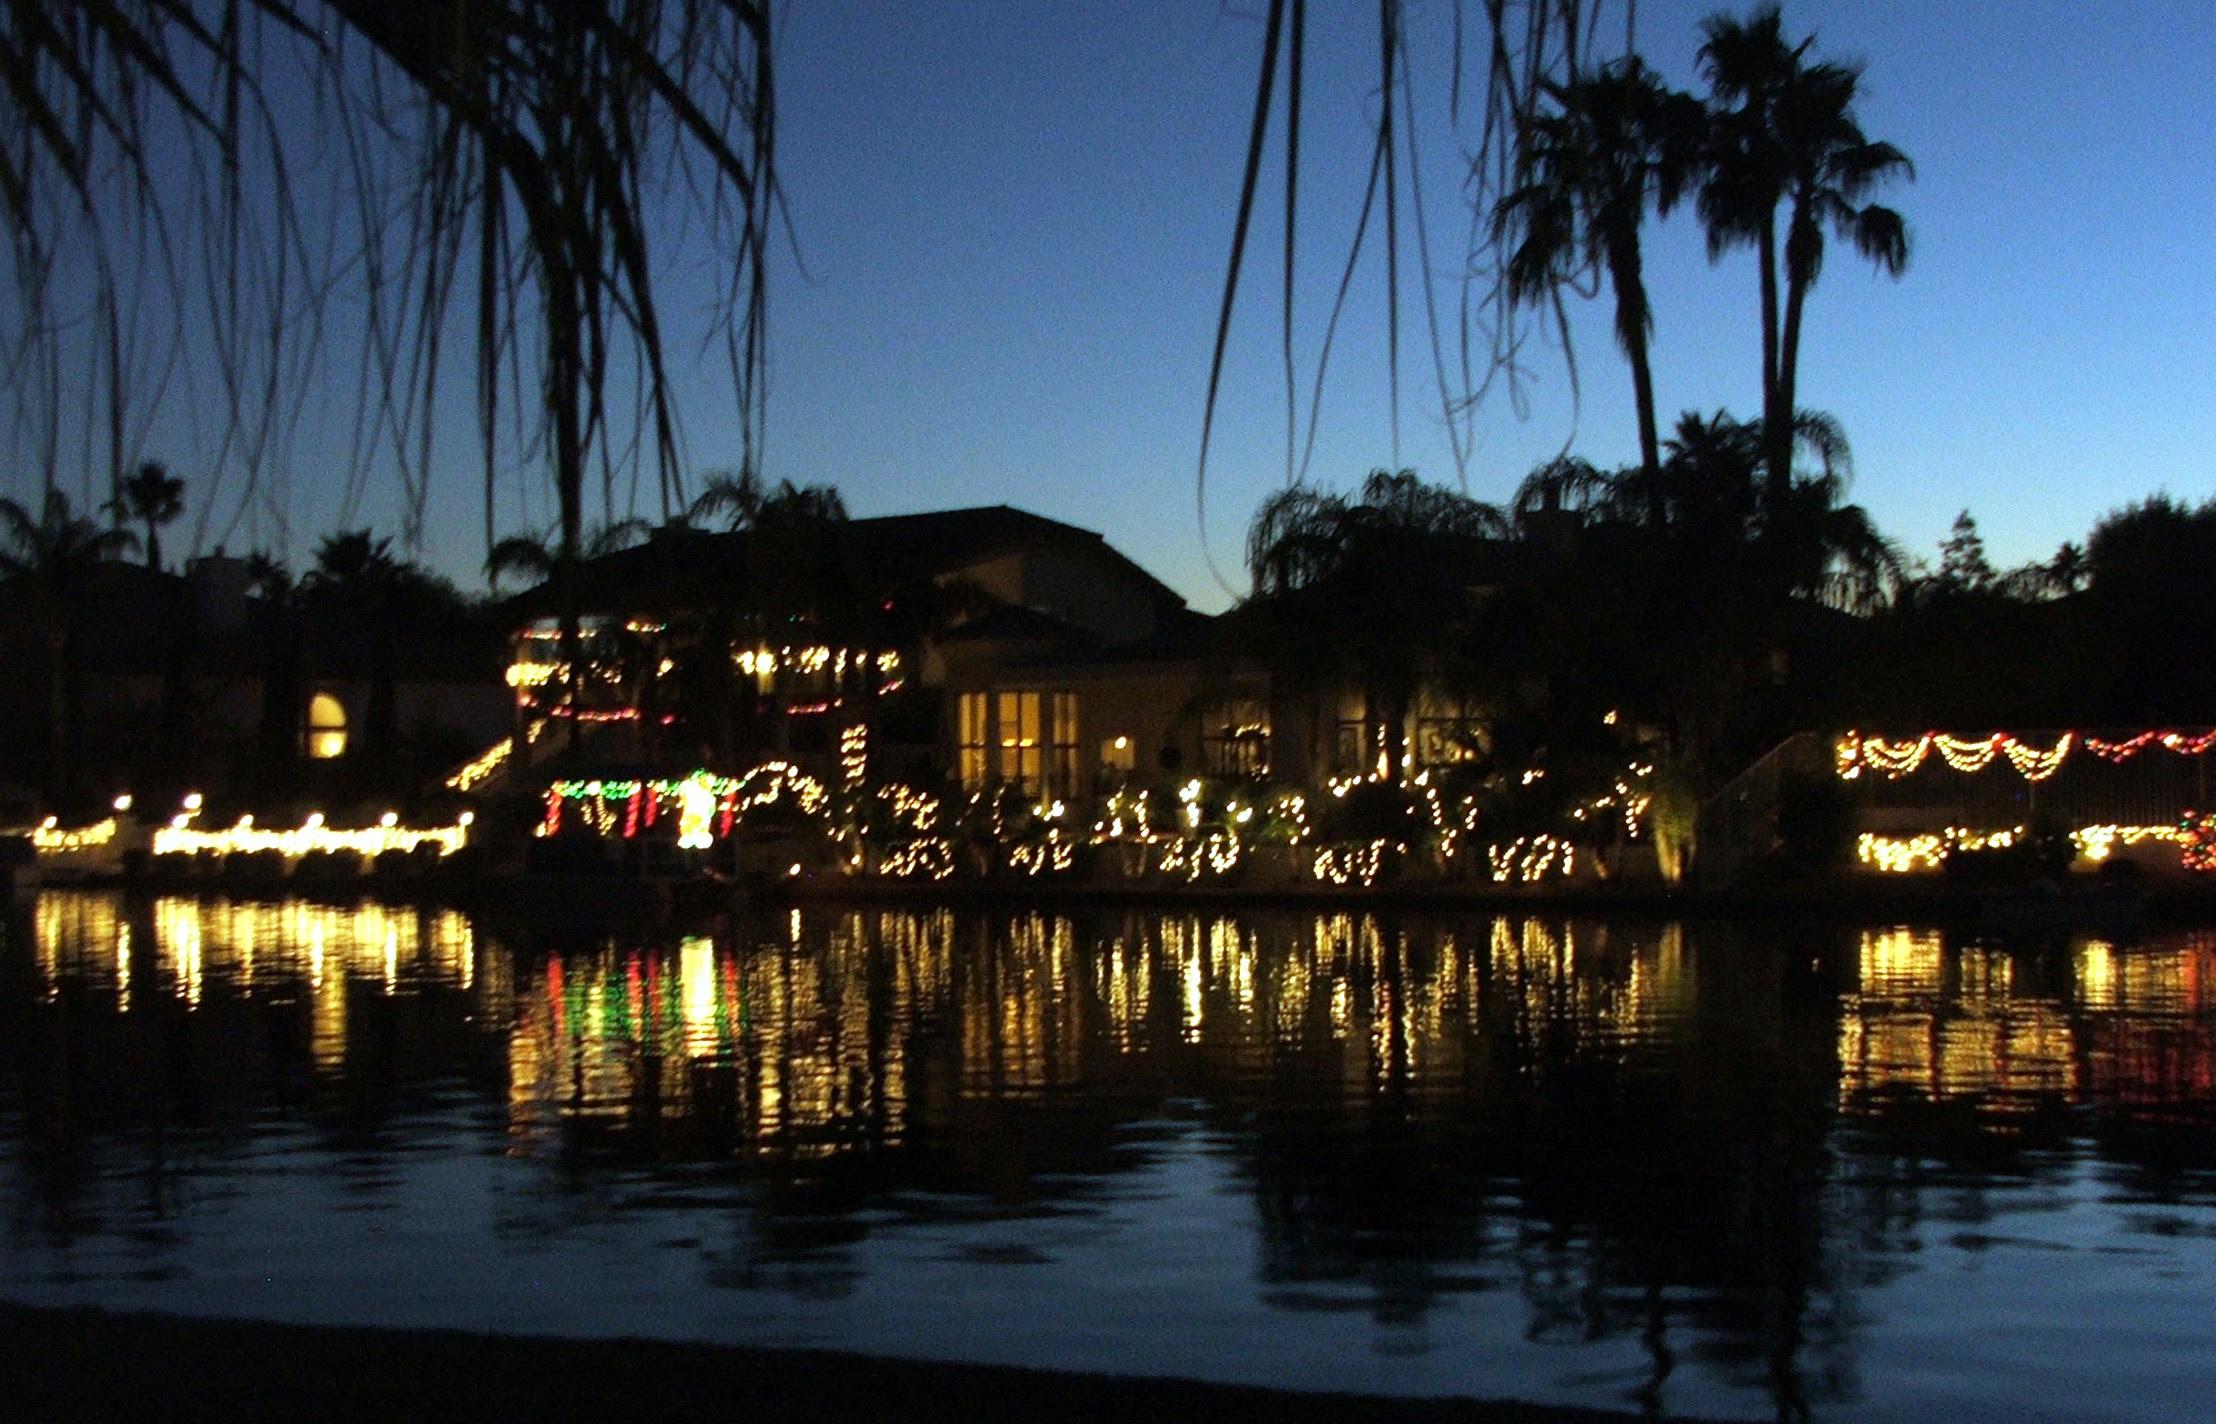 Phoenix Arizona Waterfront Homes» Waterfront Holiday Christmas